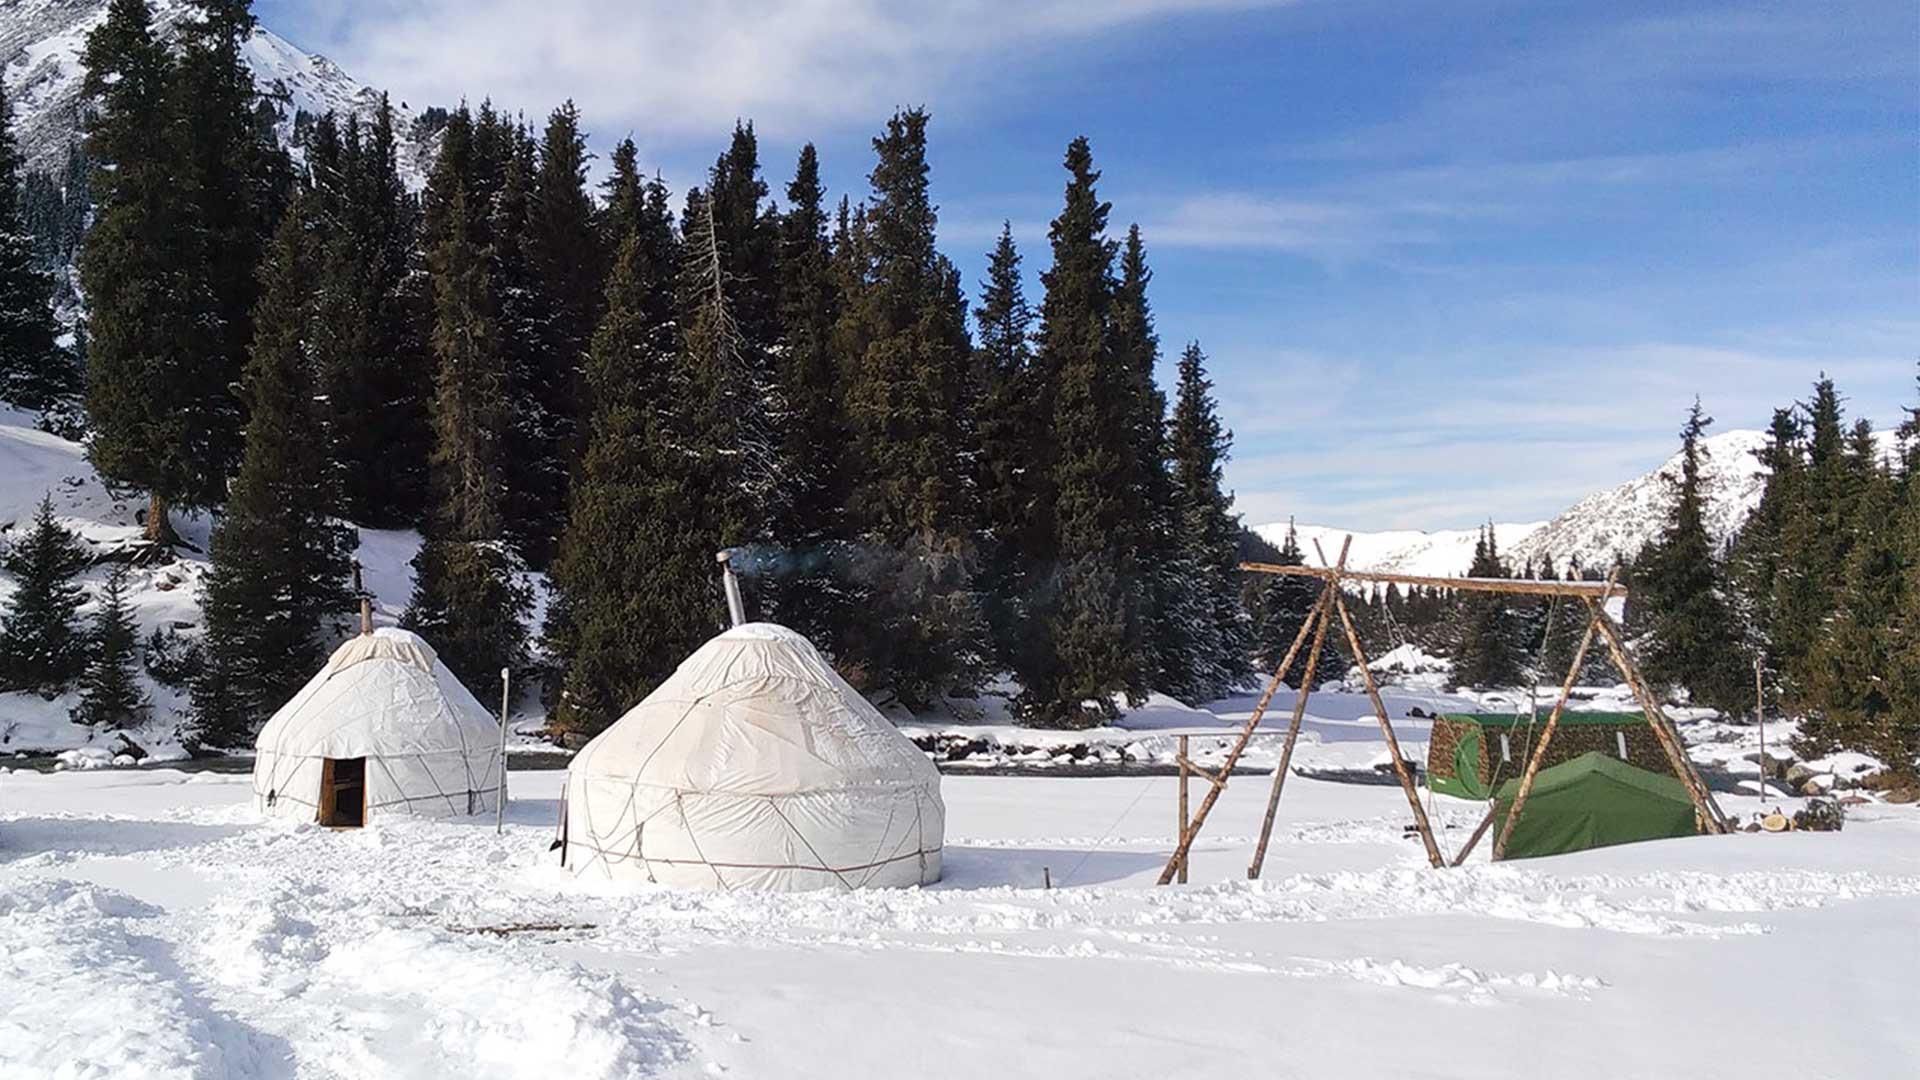 Camp of yurts in Kyrgyzstan snow resort